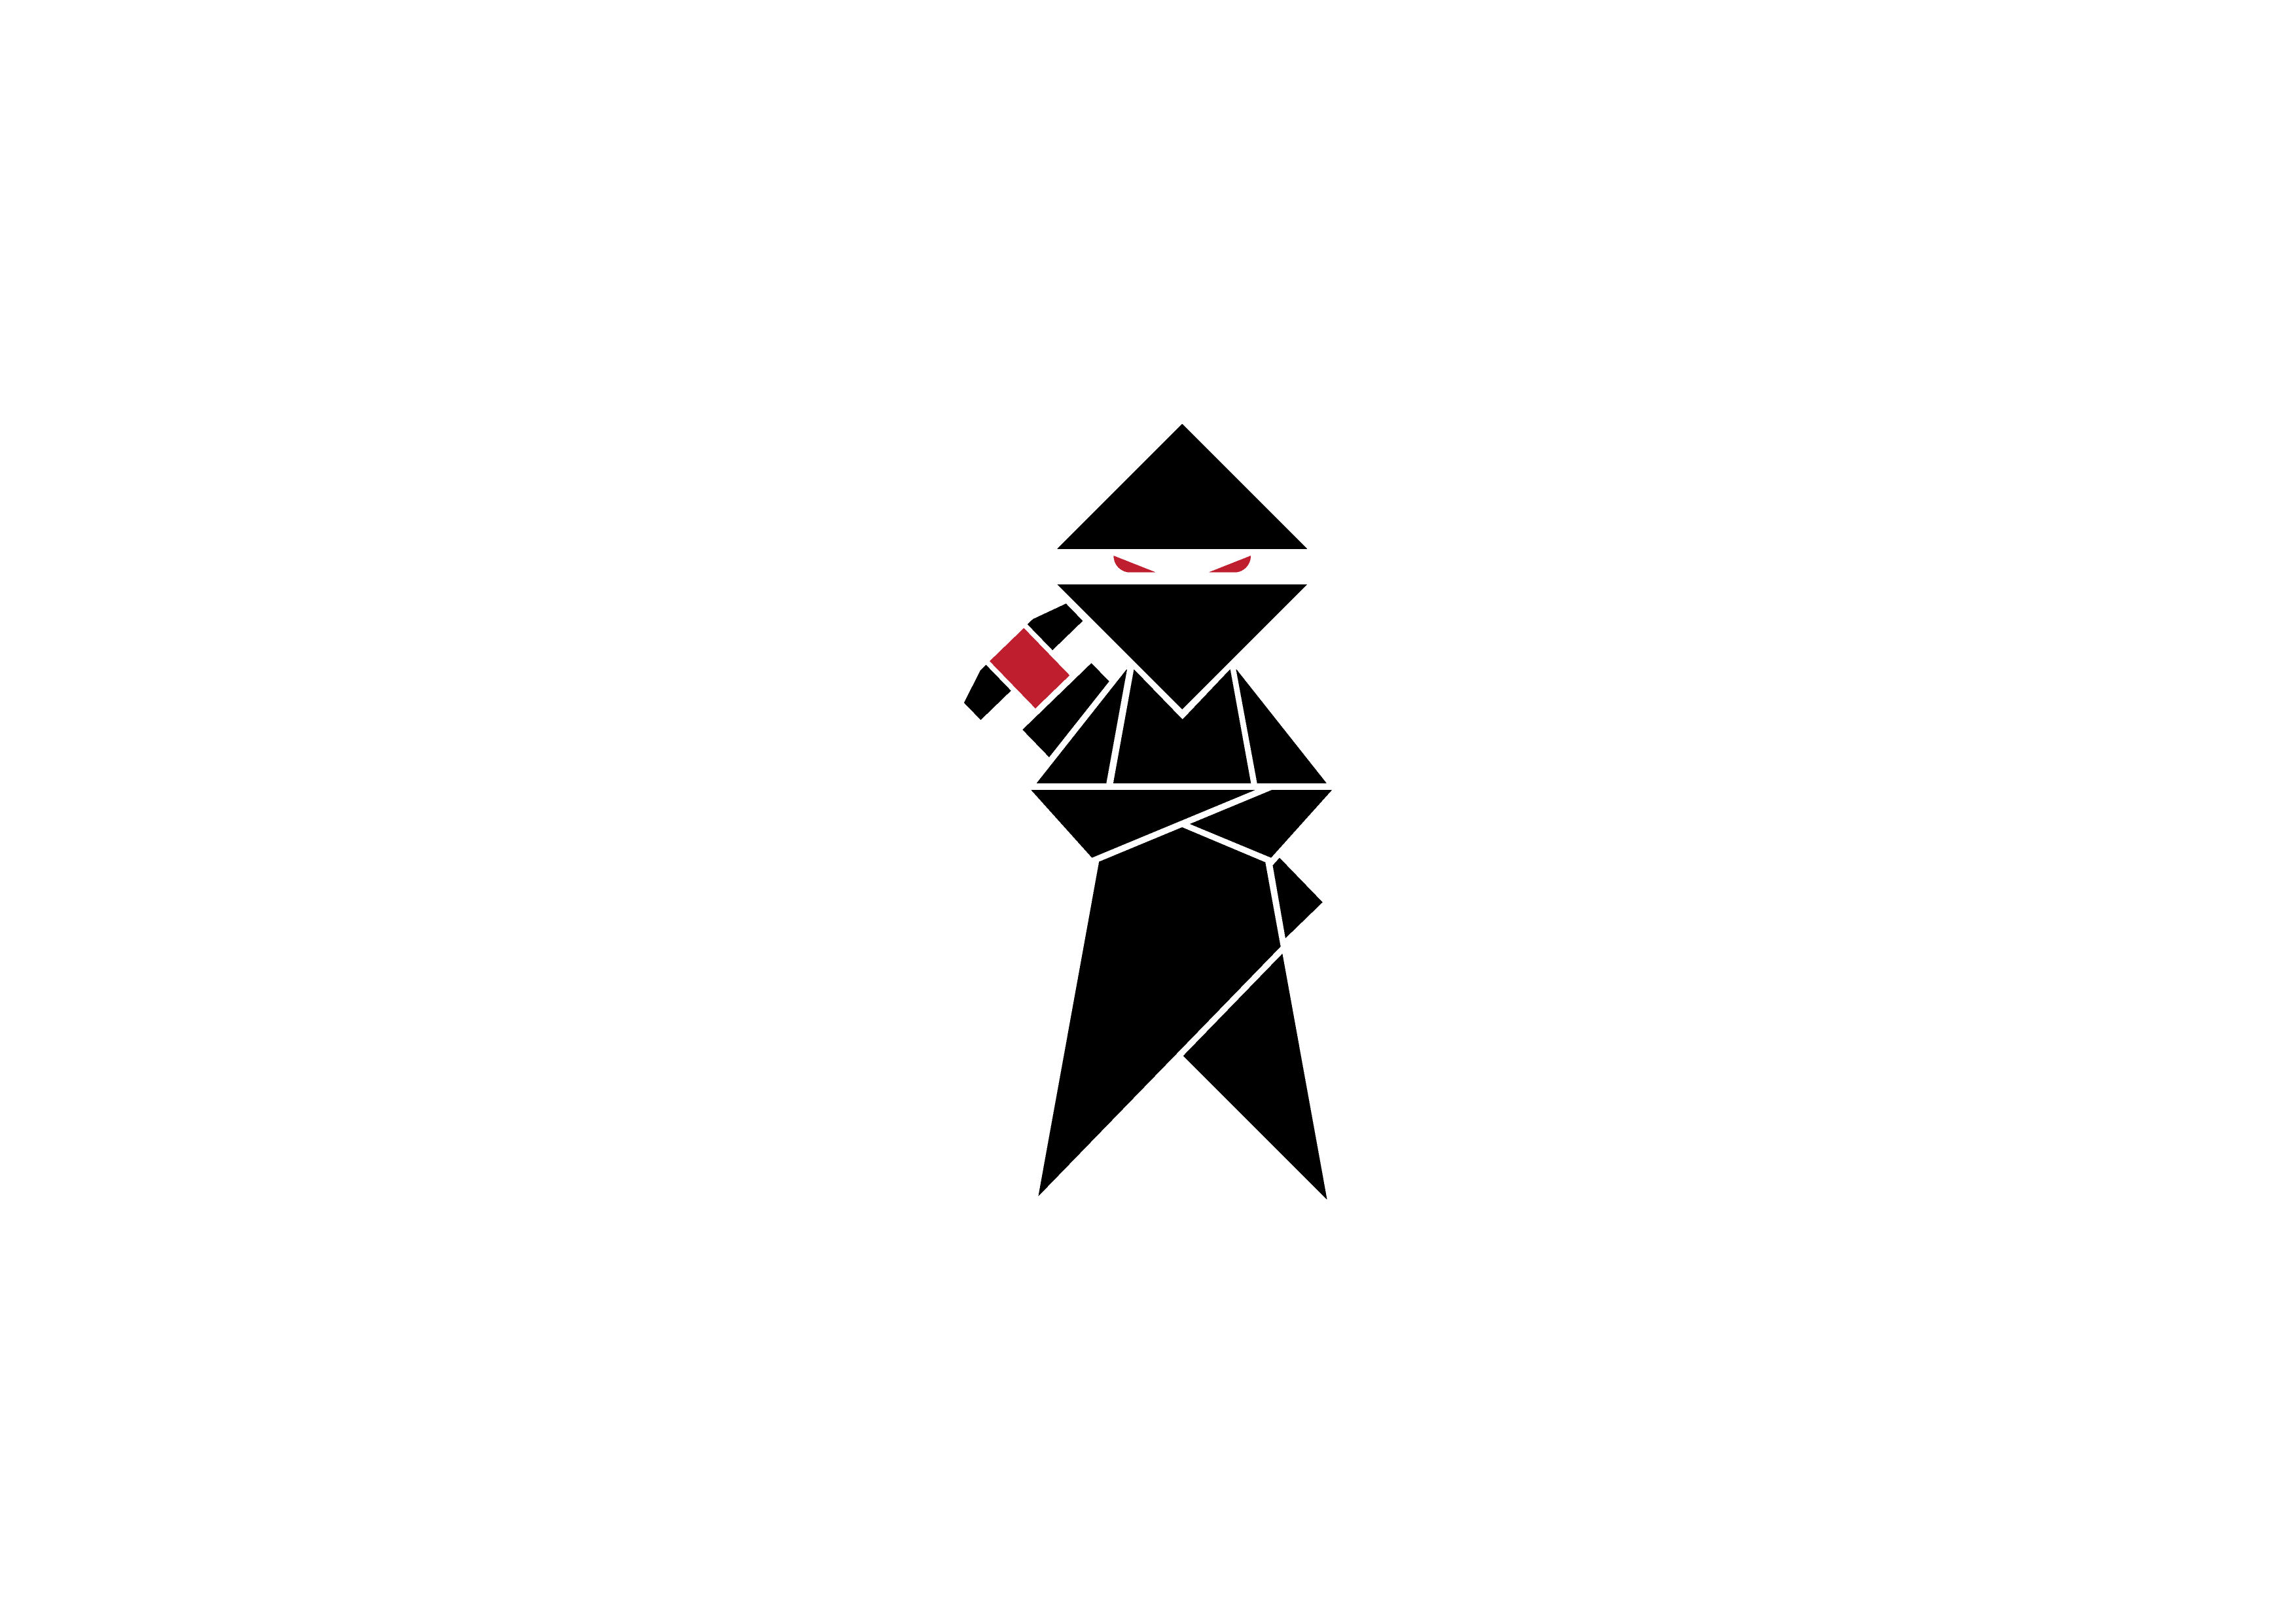 5. Quinta entrega-06